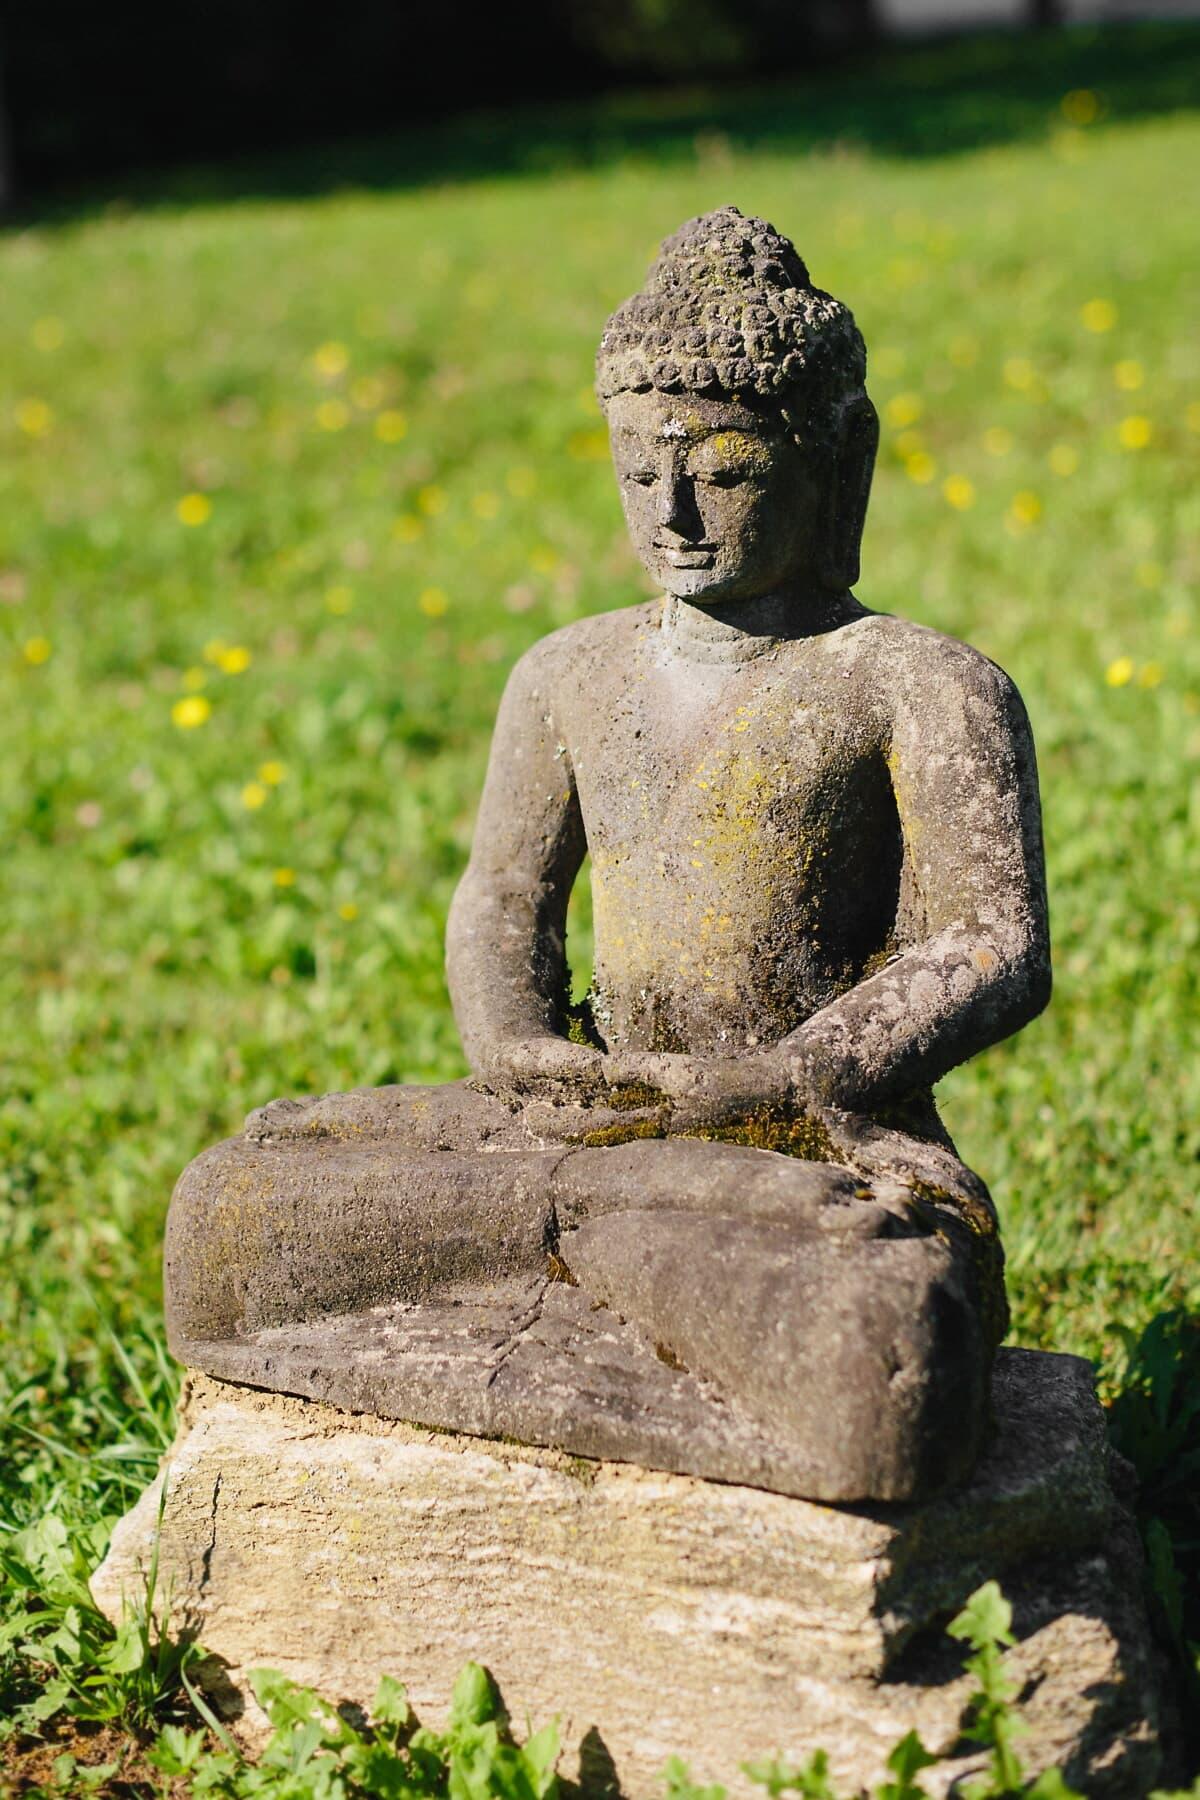 Буддизм, Медитация, Будда, скульптура, Zen, религия, статуя, камень, Культура, храм